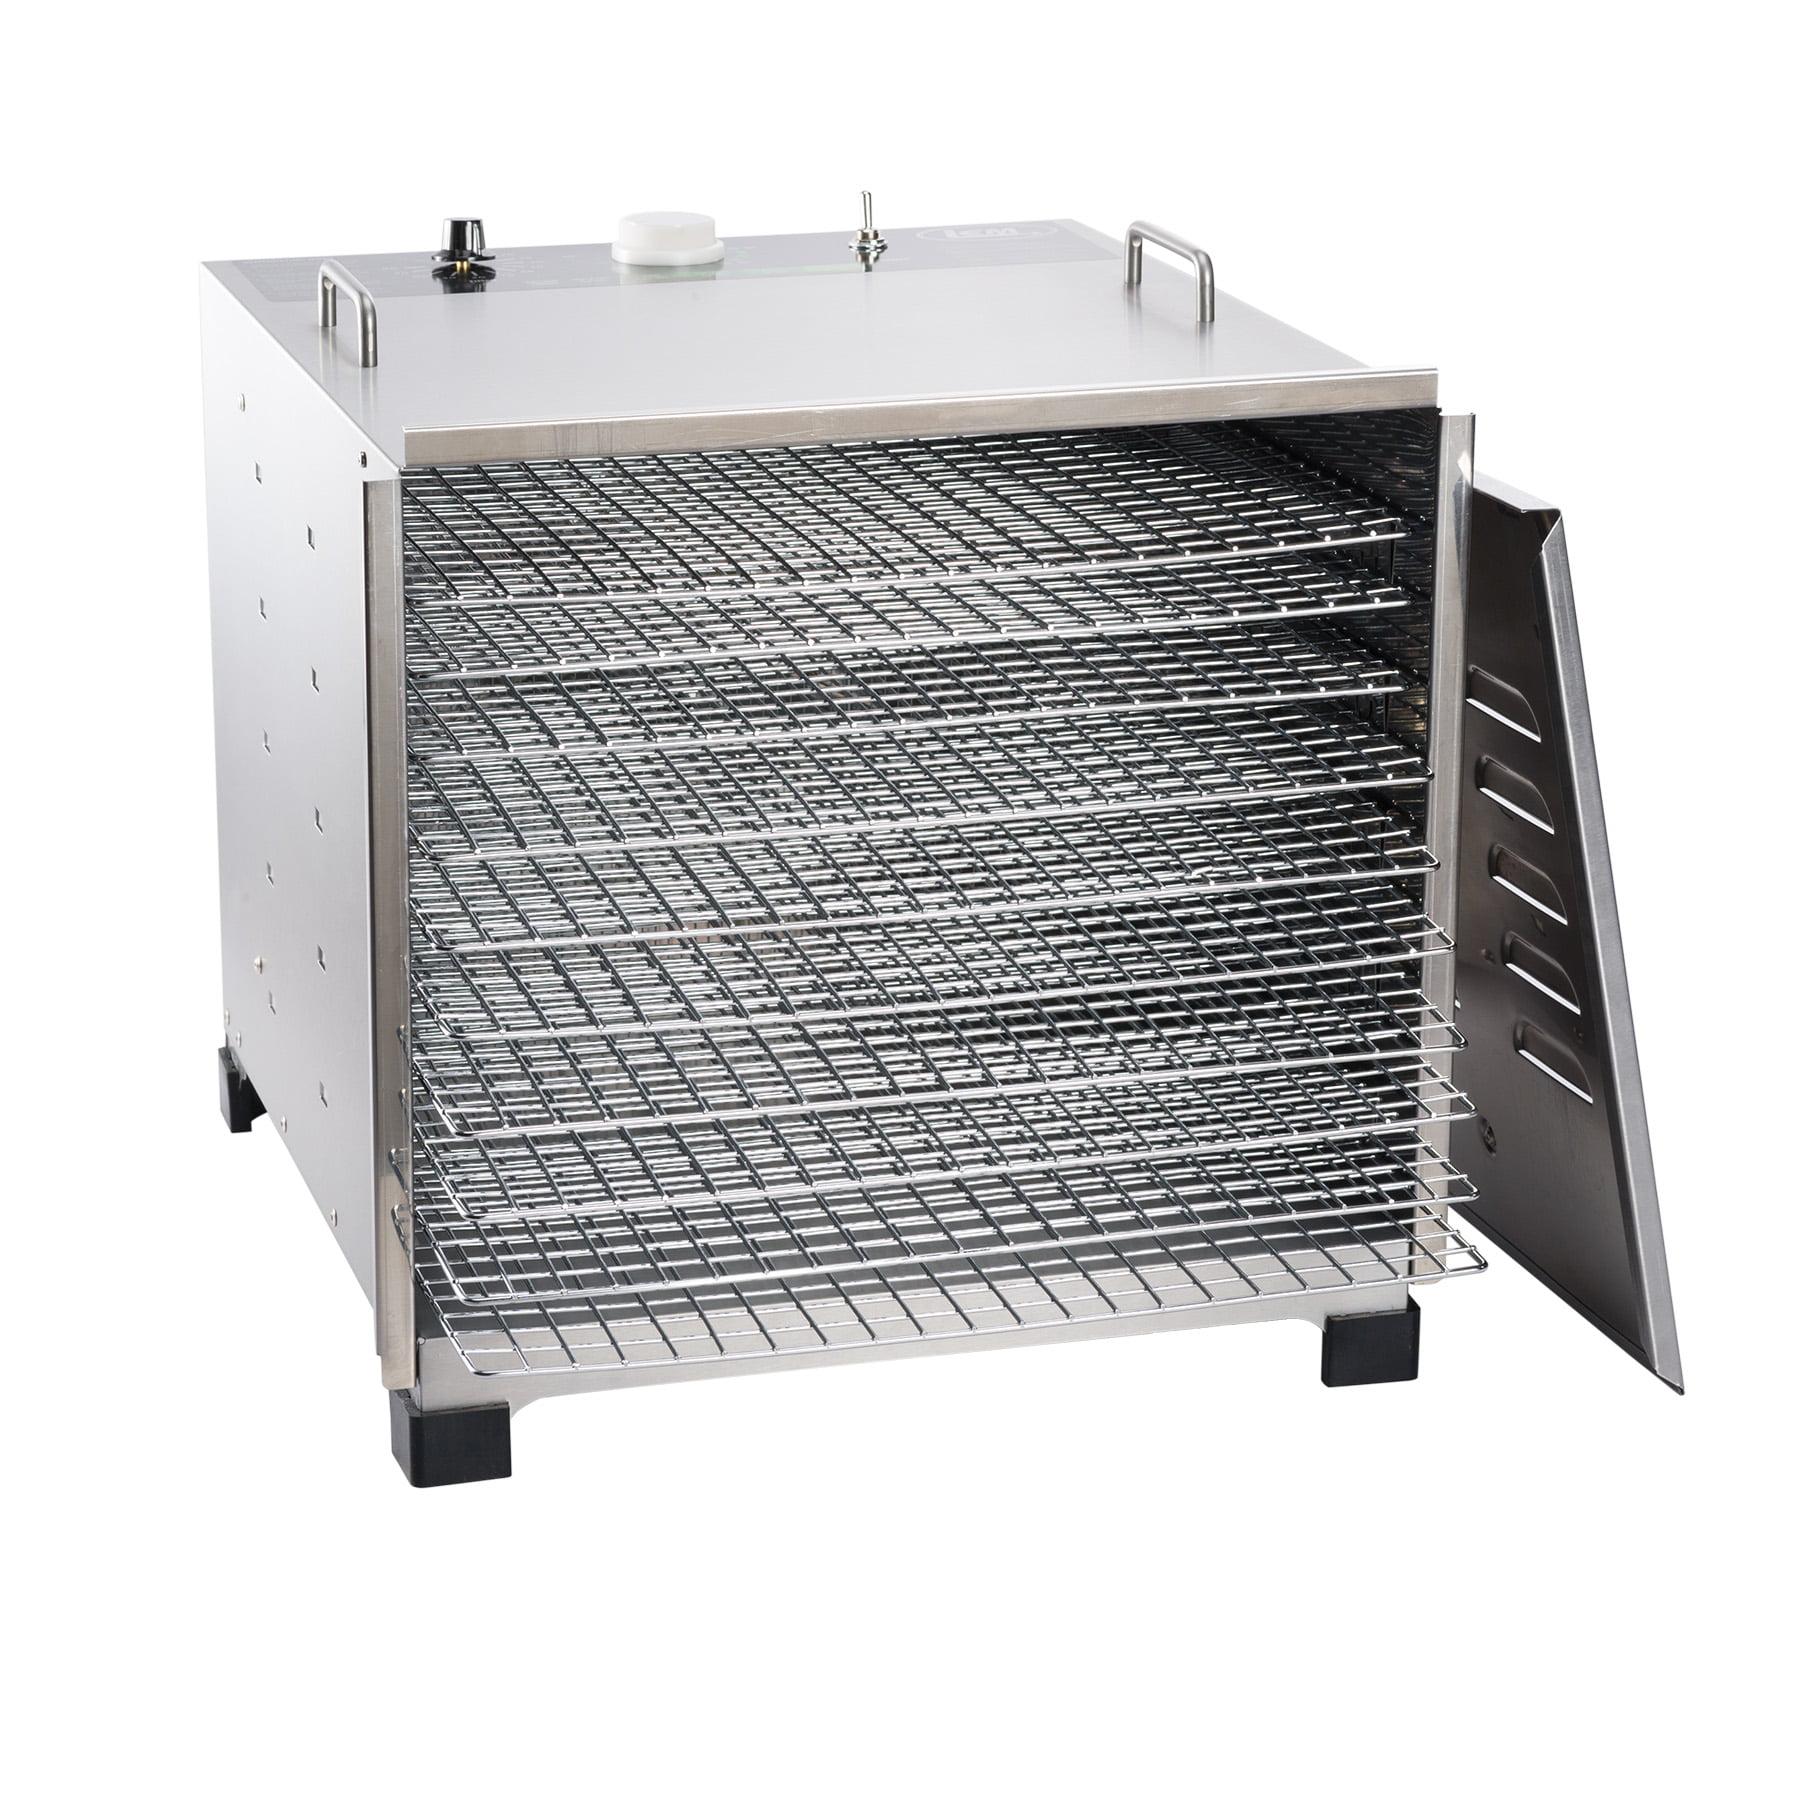 Big Bite Stainless Steel Dehydrator w/ Chrome Plated Trays (10 tray)